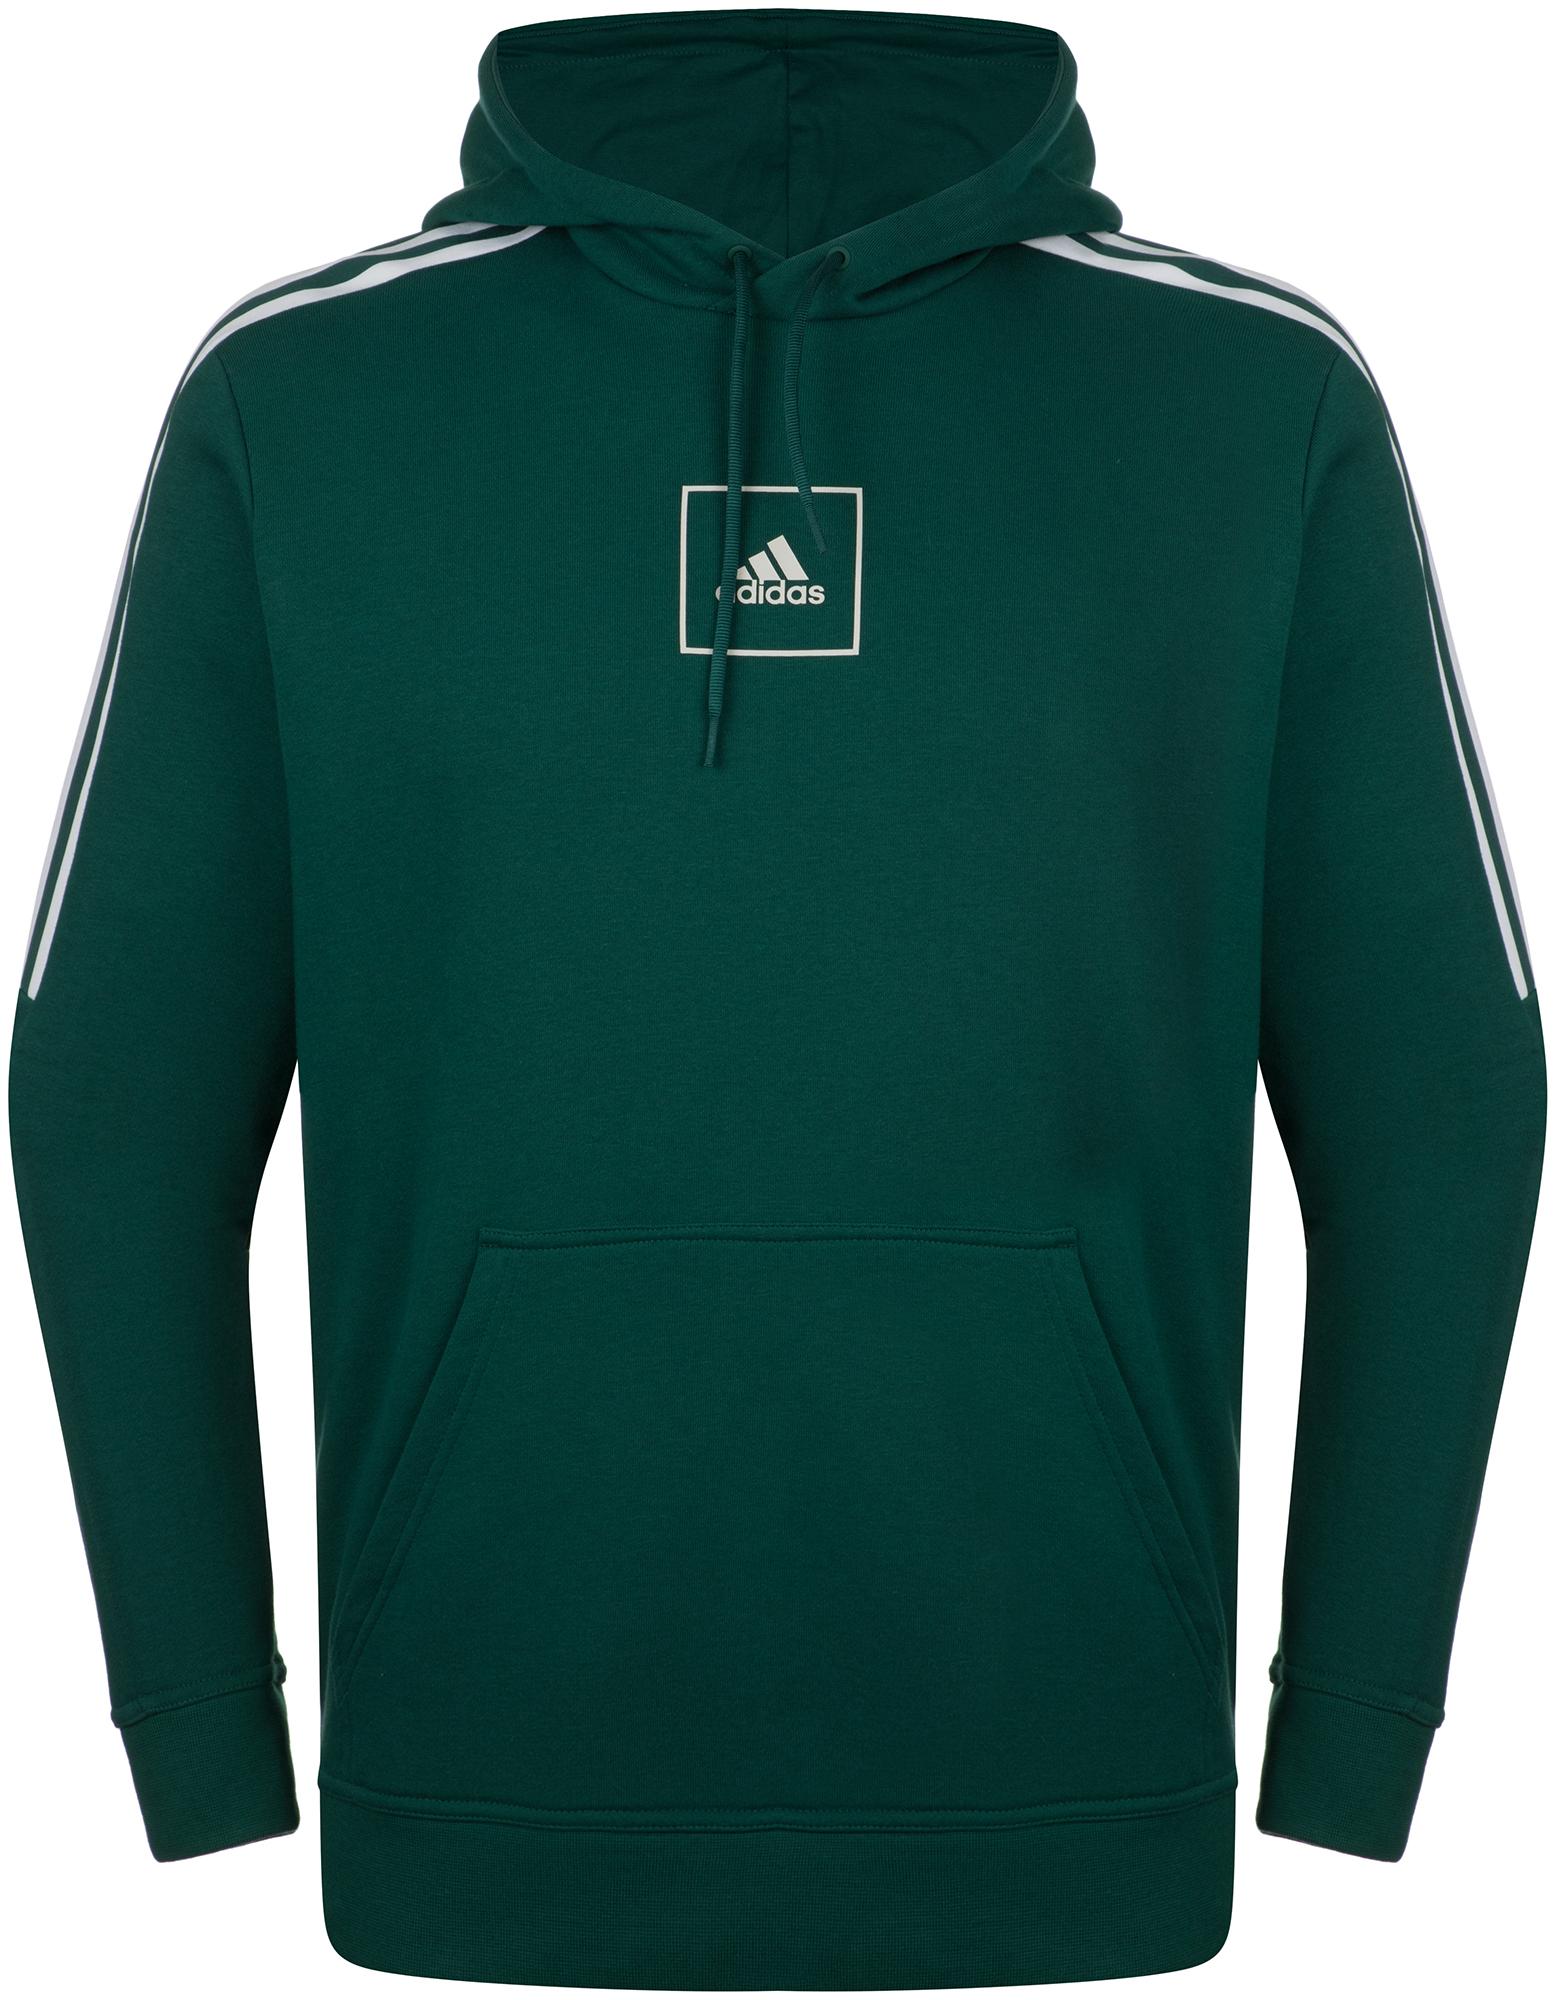 худи женское adidas ess 3s fz hd цвет серый розовый br2438 размер s 42 44 Adidas Худи мужская Adidas 3-Stripes, размер 48-50